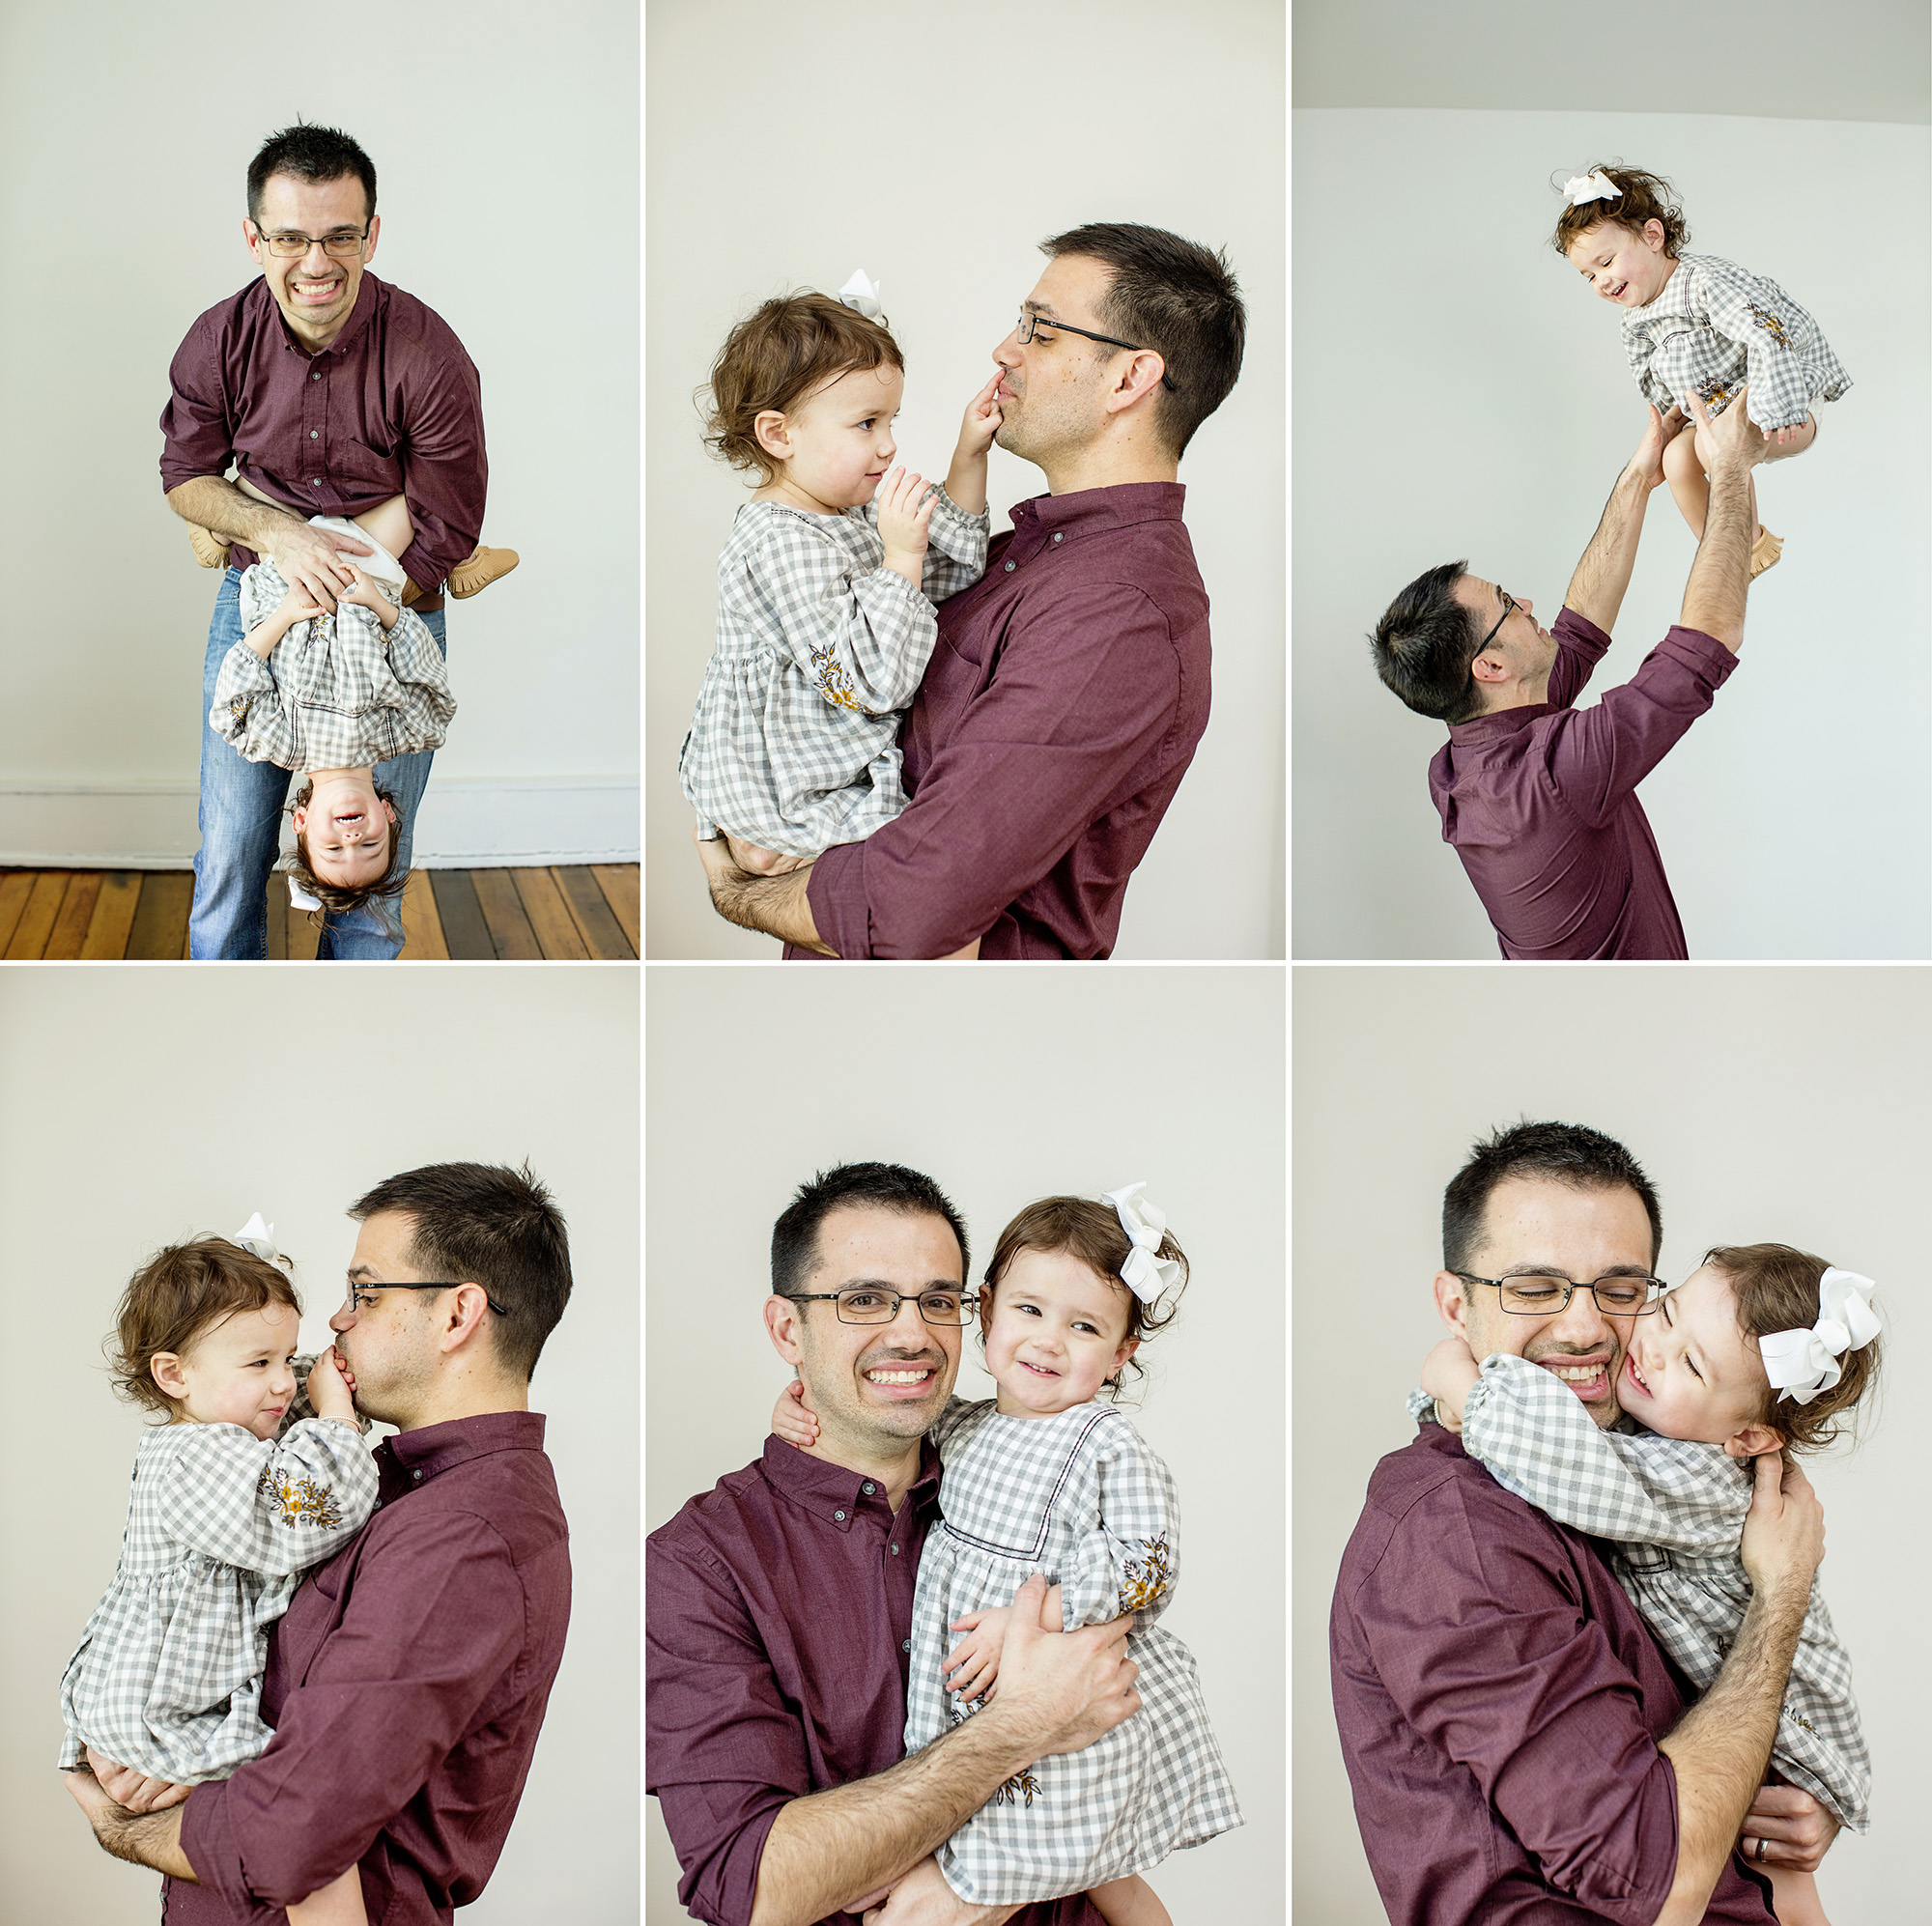 Seriously_Sabrina_Photography_Lexington_Kentucky_Studio_Lex_Portraits_Family_Oyler23.jpg